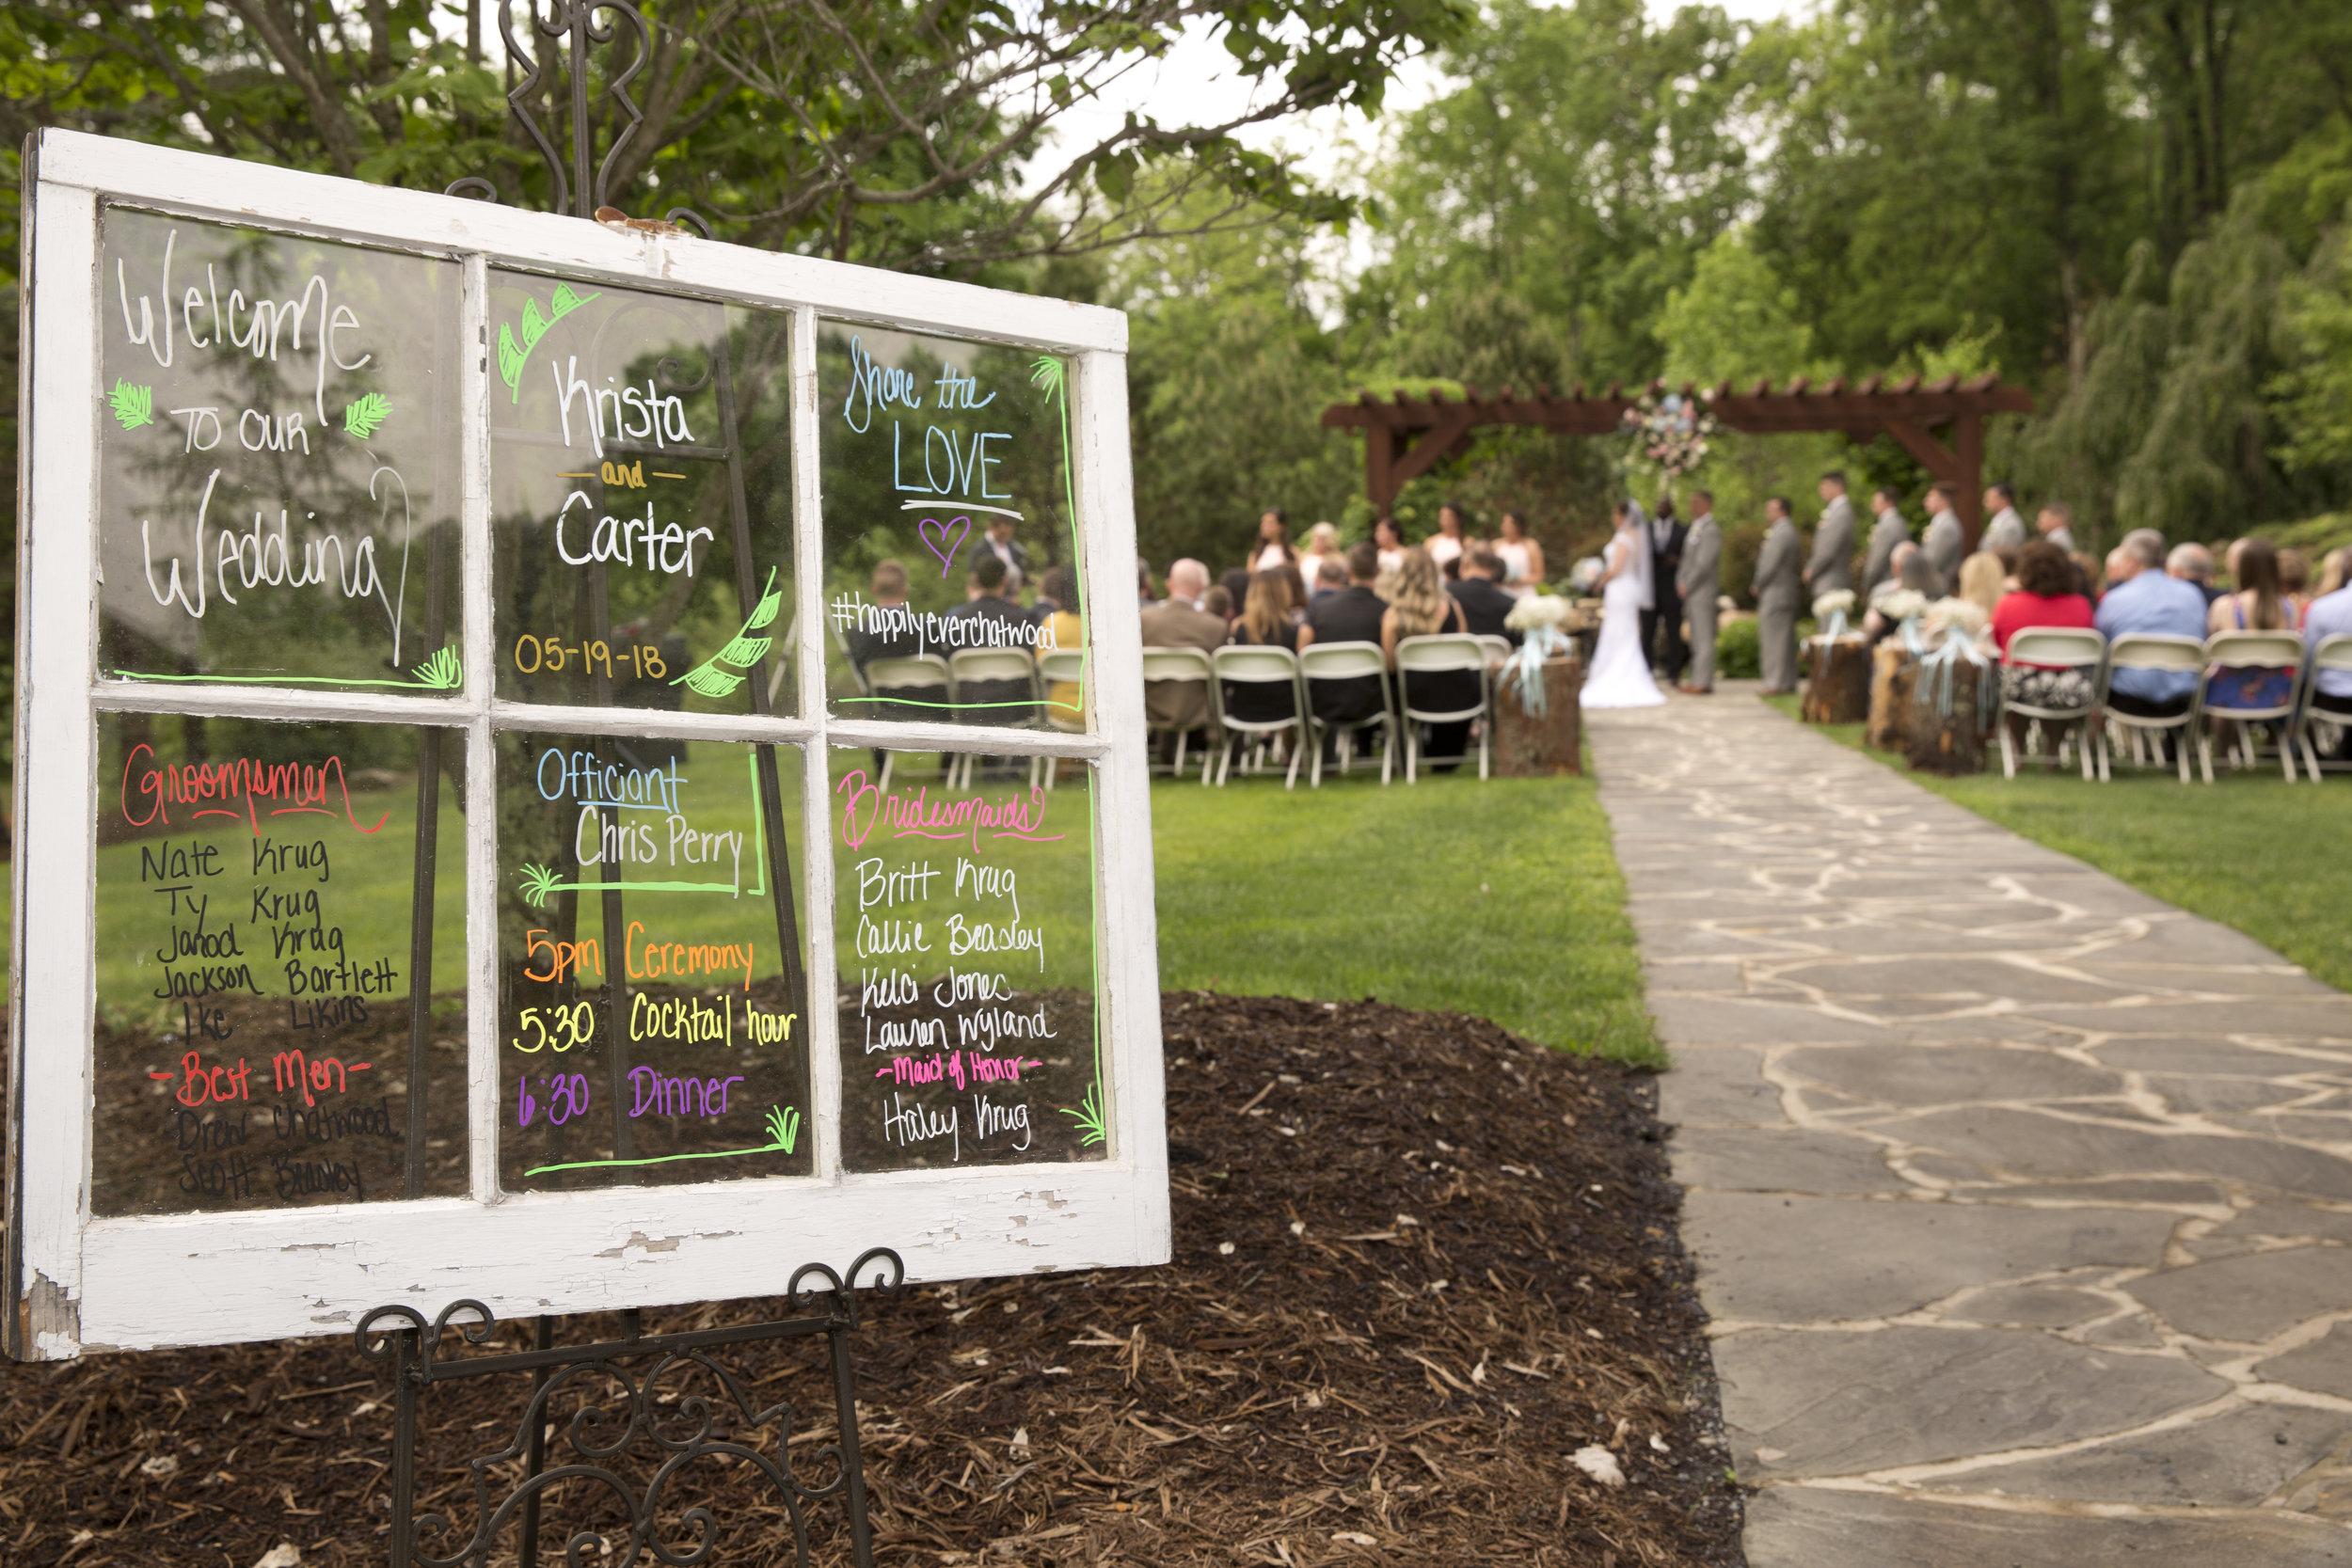 2018_Krug-Chatwood Wedding_Ceremony_Final_F78A9999_0058 (2).jpg